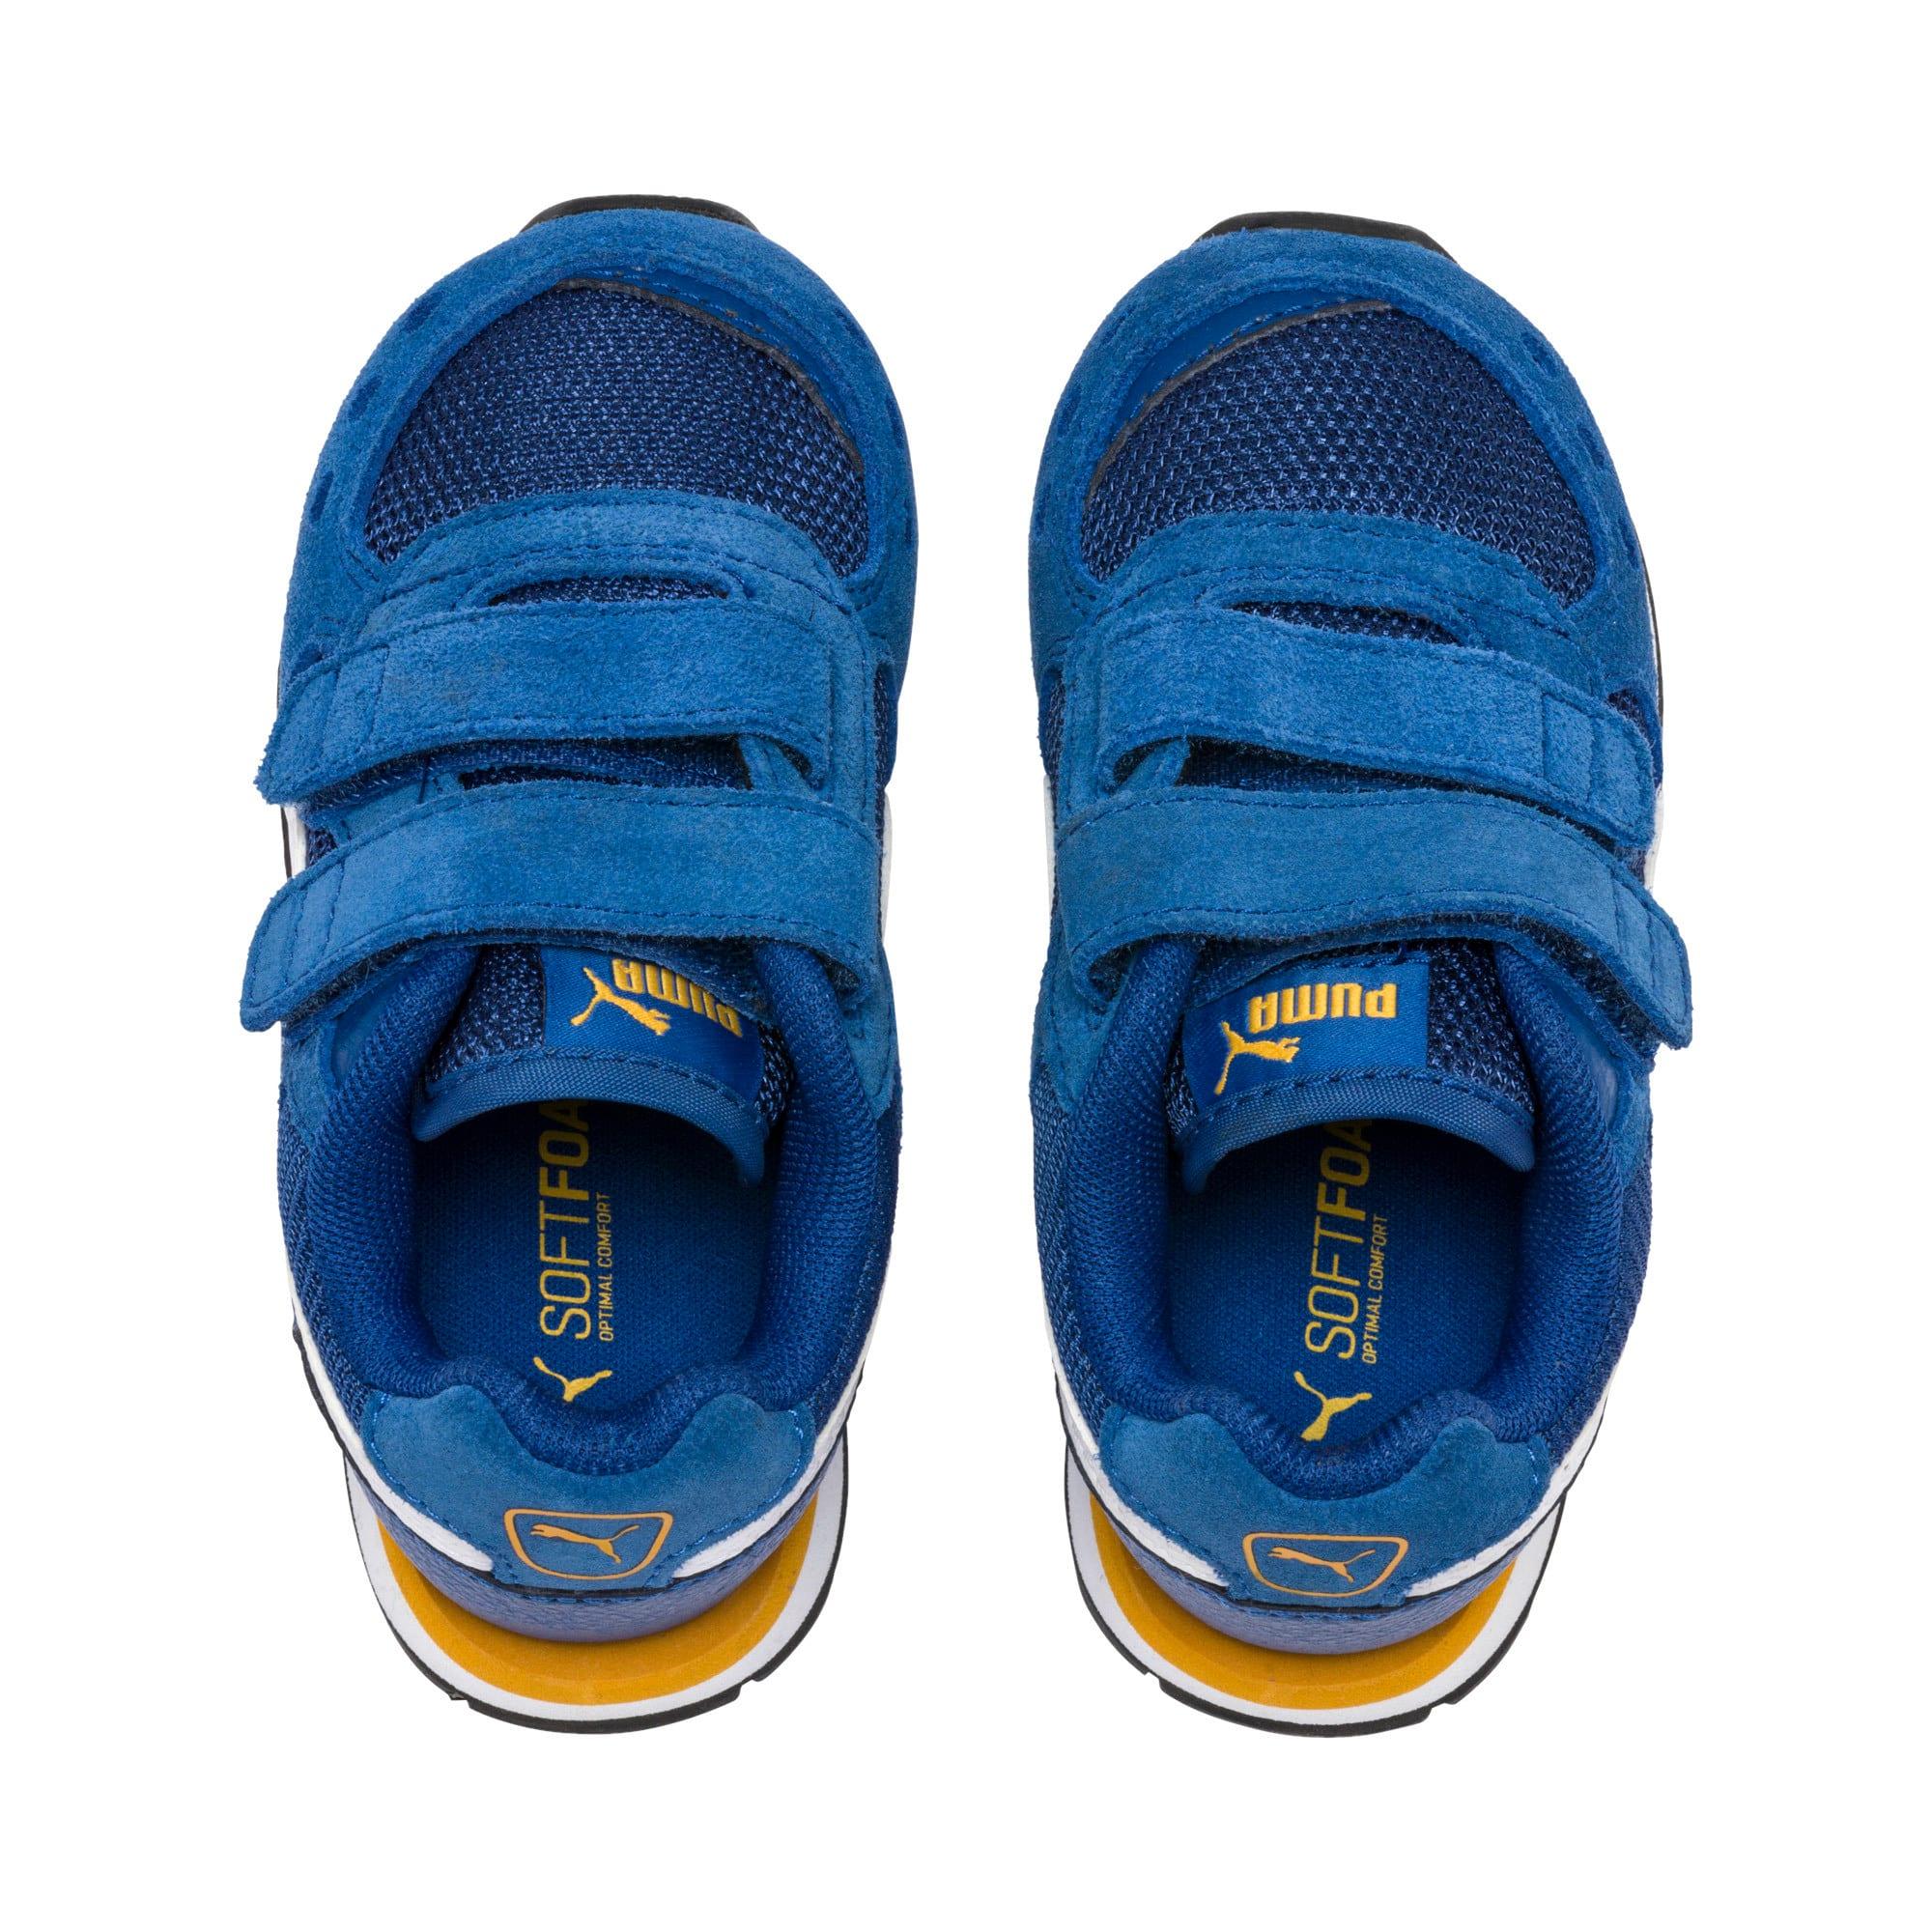 Thumbnail 6 of Vista Toddler Shoes, Galaxy Blue-Puma White, medium